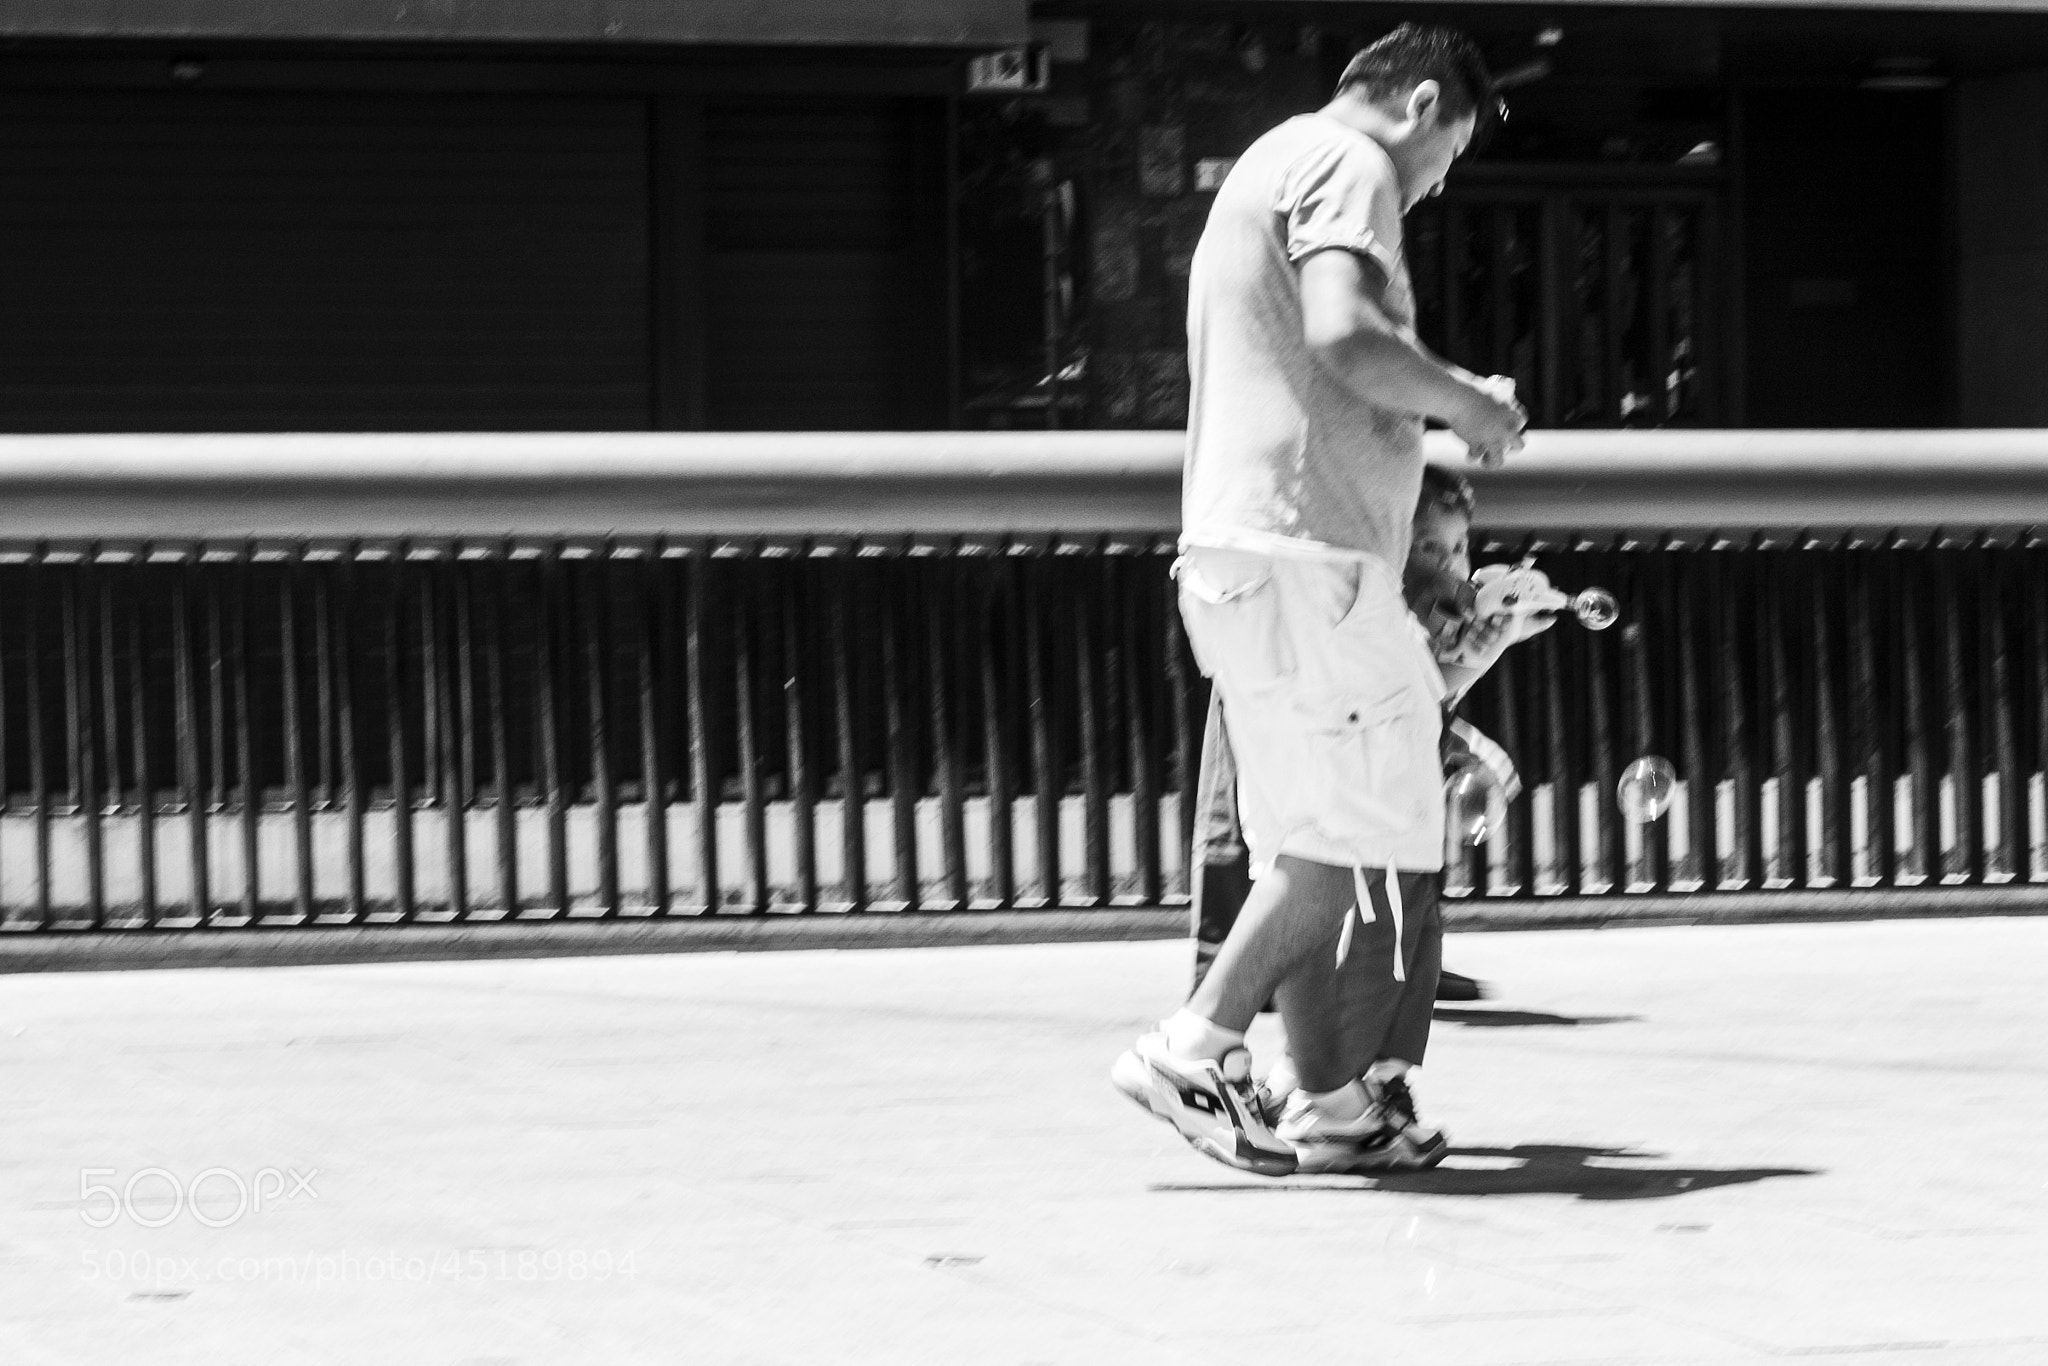 Photograph Padre e hijo by Rebeca Moncho on 500px